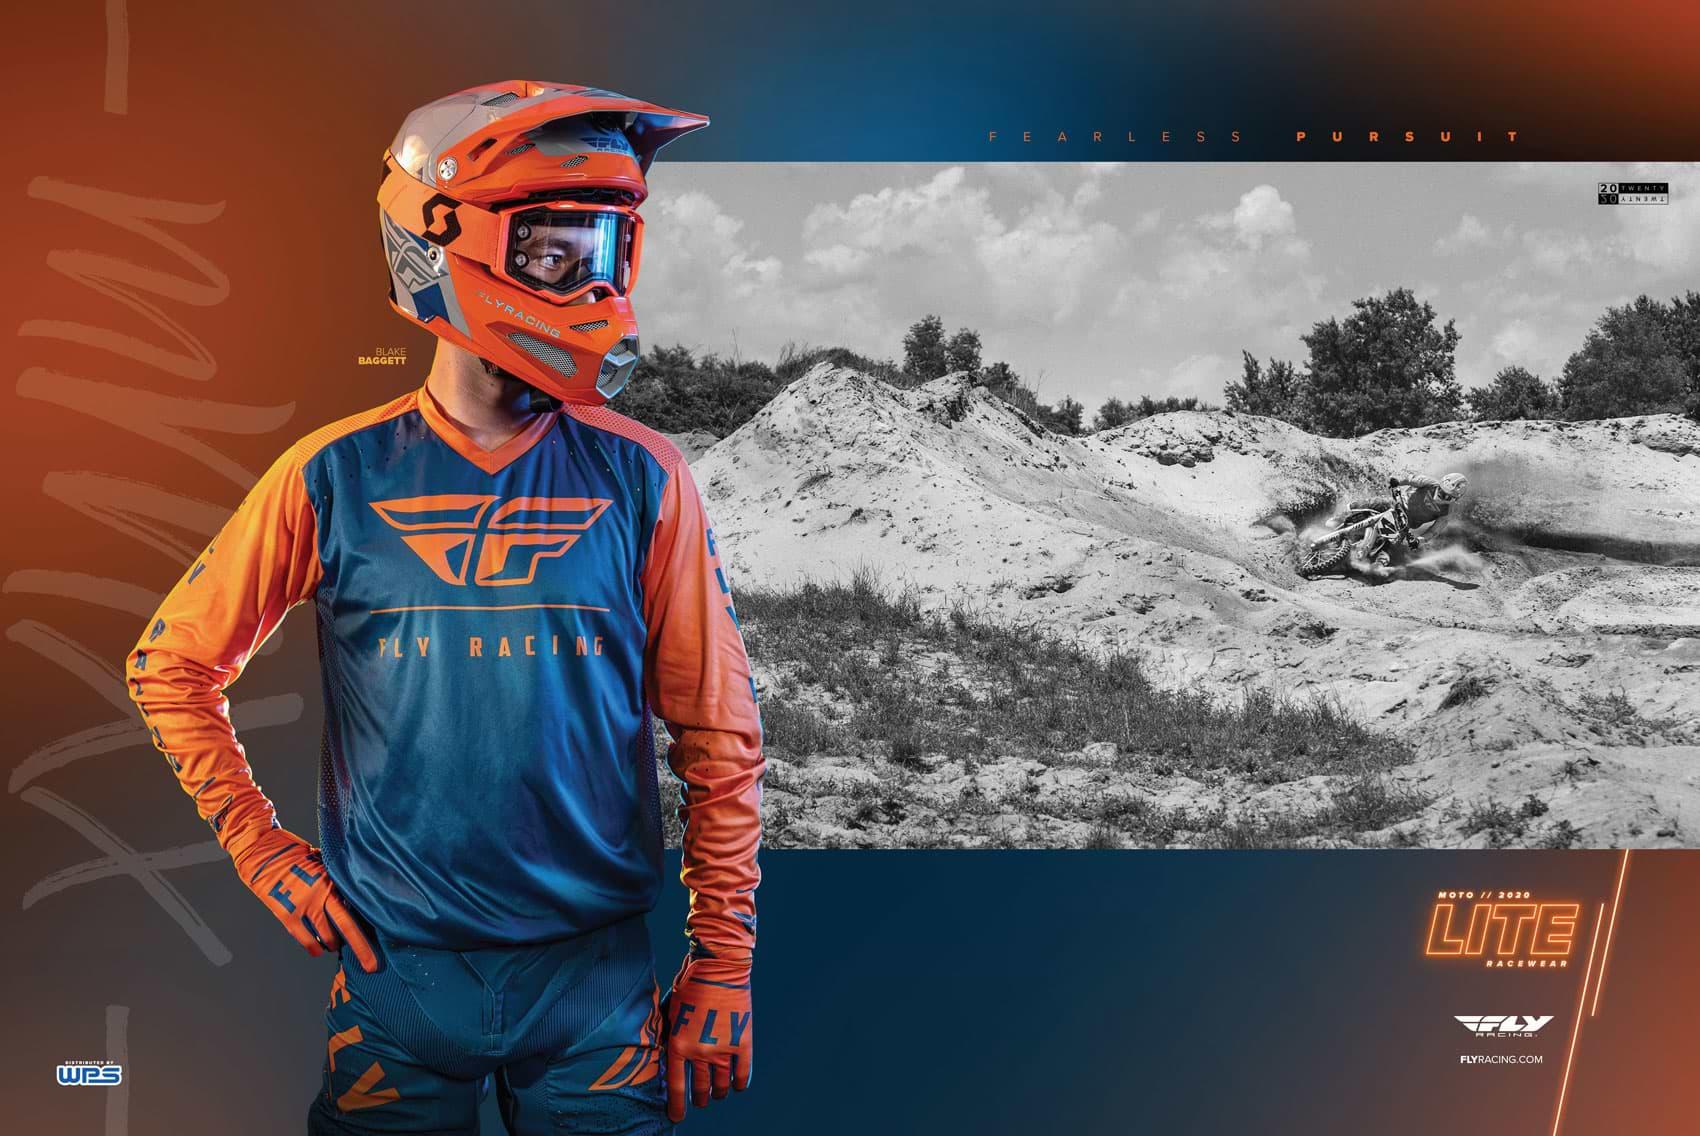 Racer X October 2019 - Fly Racing Advertisement